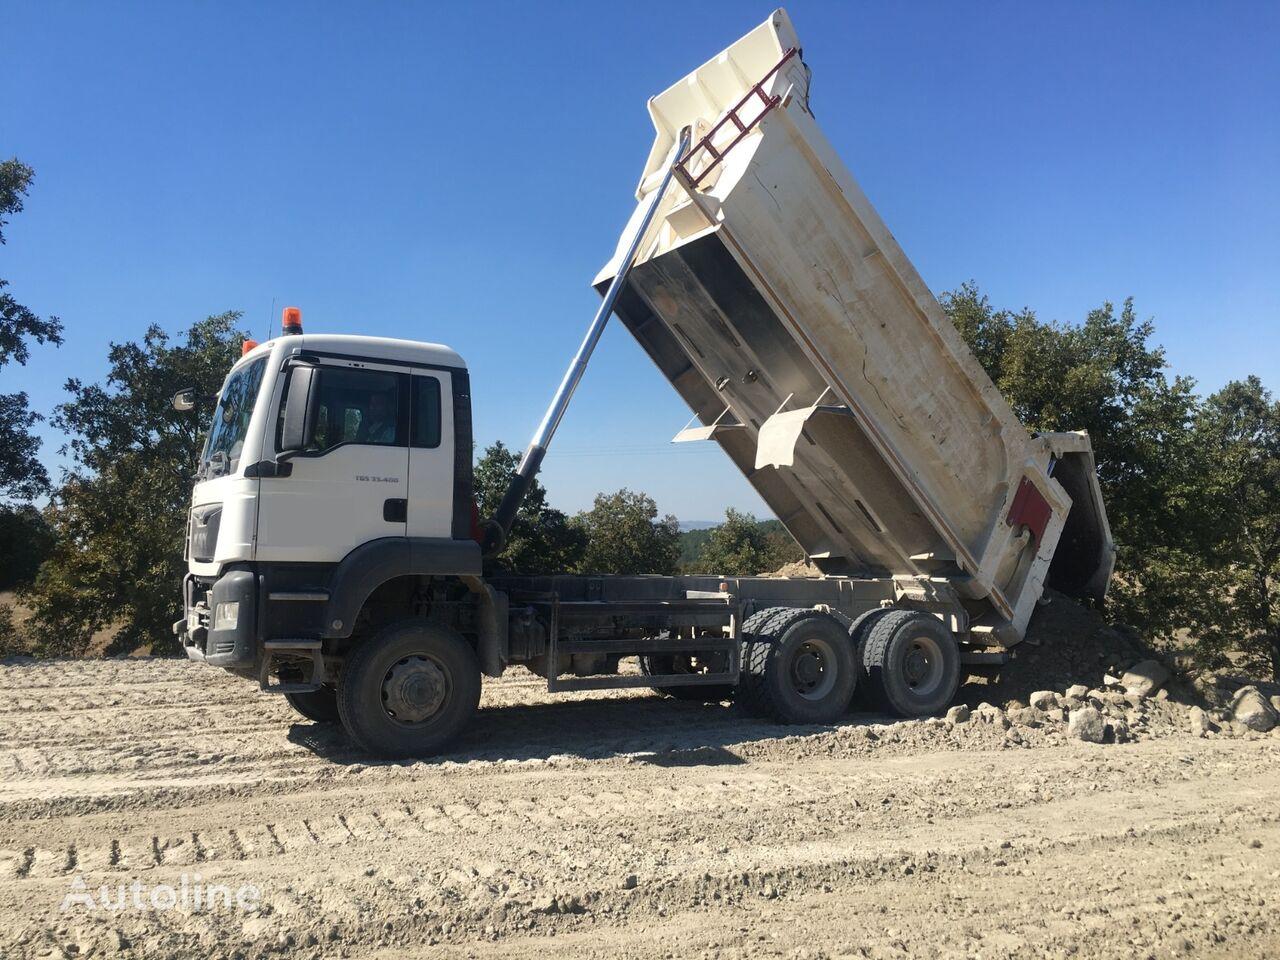 MAN 6X6 SPECIAL 25 UNIT TGS 33.420 2016-2017 YEARS dump truck < 3.5t